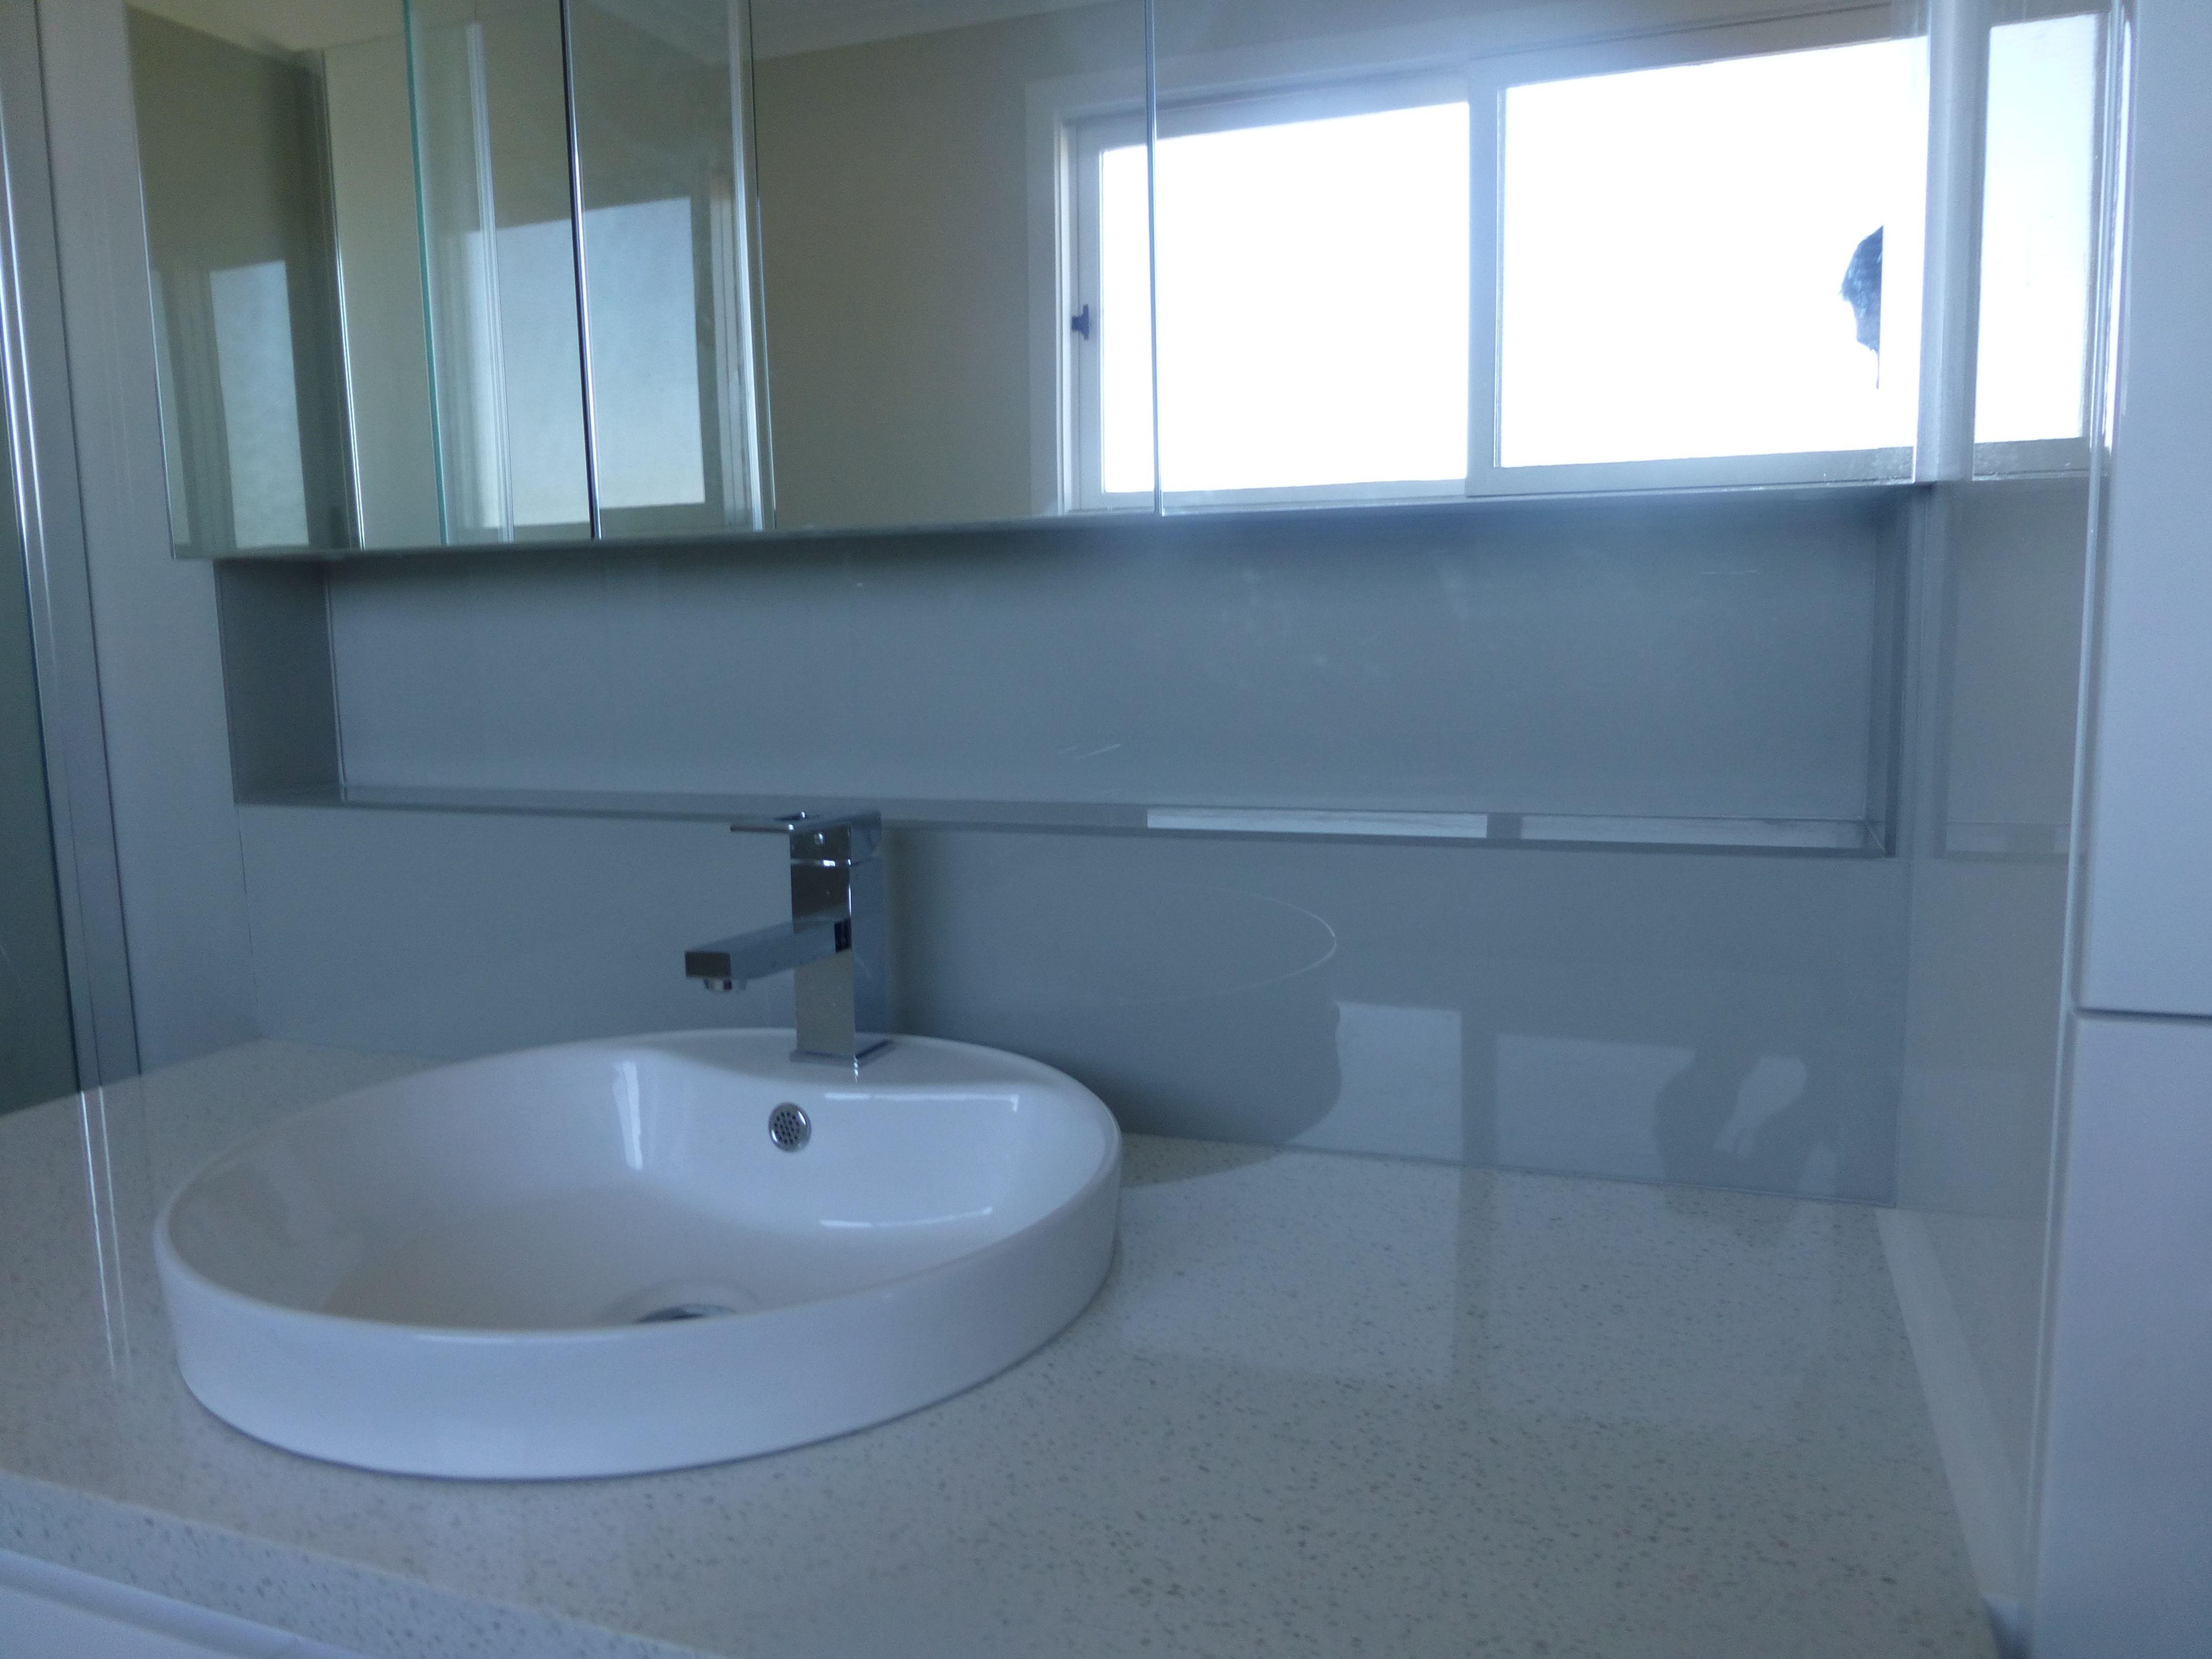 The Face Of Bathroom Luxury. Innovative Splashbacks® bring modern ...